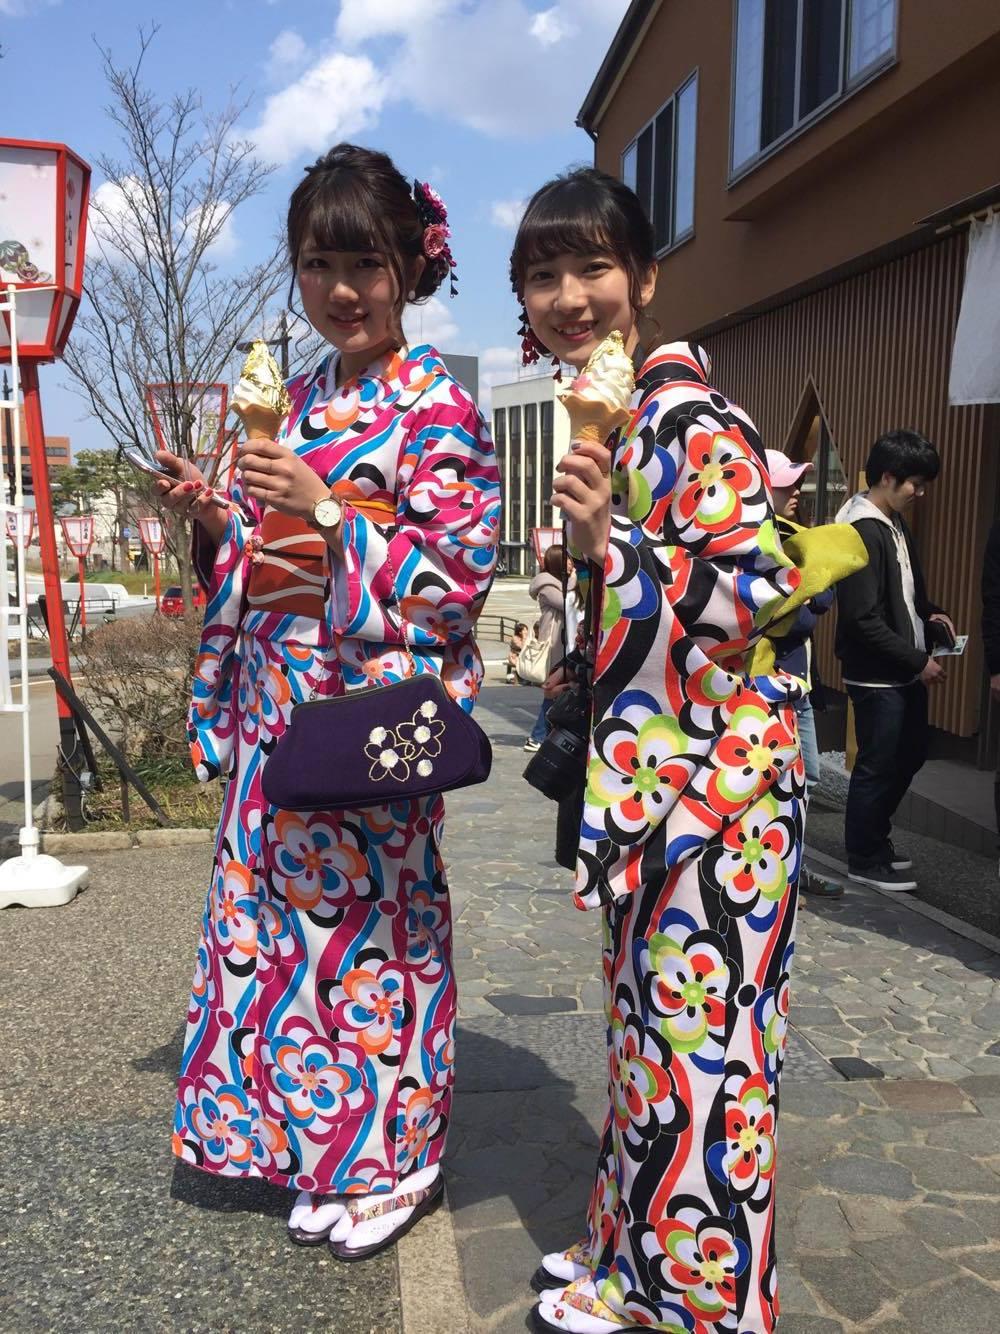 Piger i kimono med guldbelagt softice